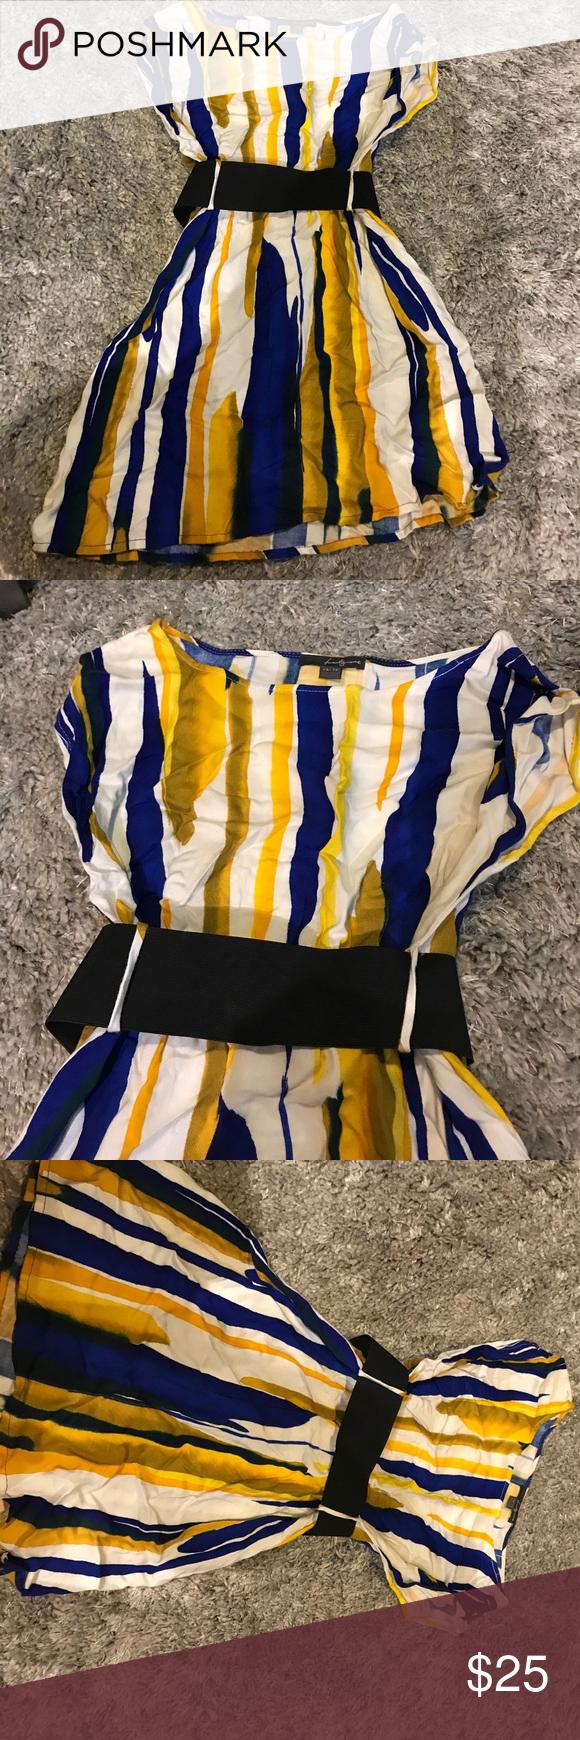 Blue Yellow And White Striped Dress Super Cute Blue Yellow And White Dress With A Black Belt In The Middl White Striped Dress Striped Dress Clothes Design [ 1740 x 580 Pixel ]